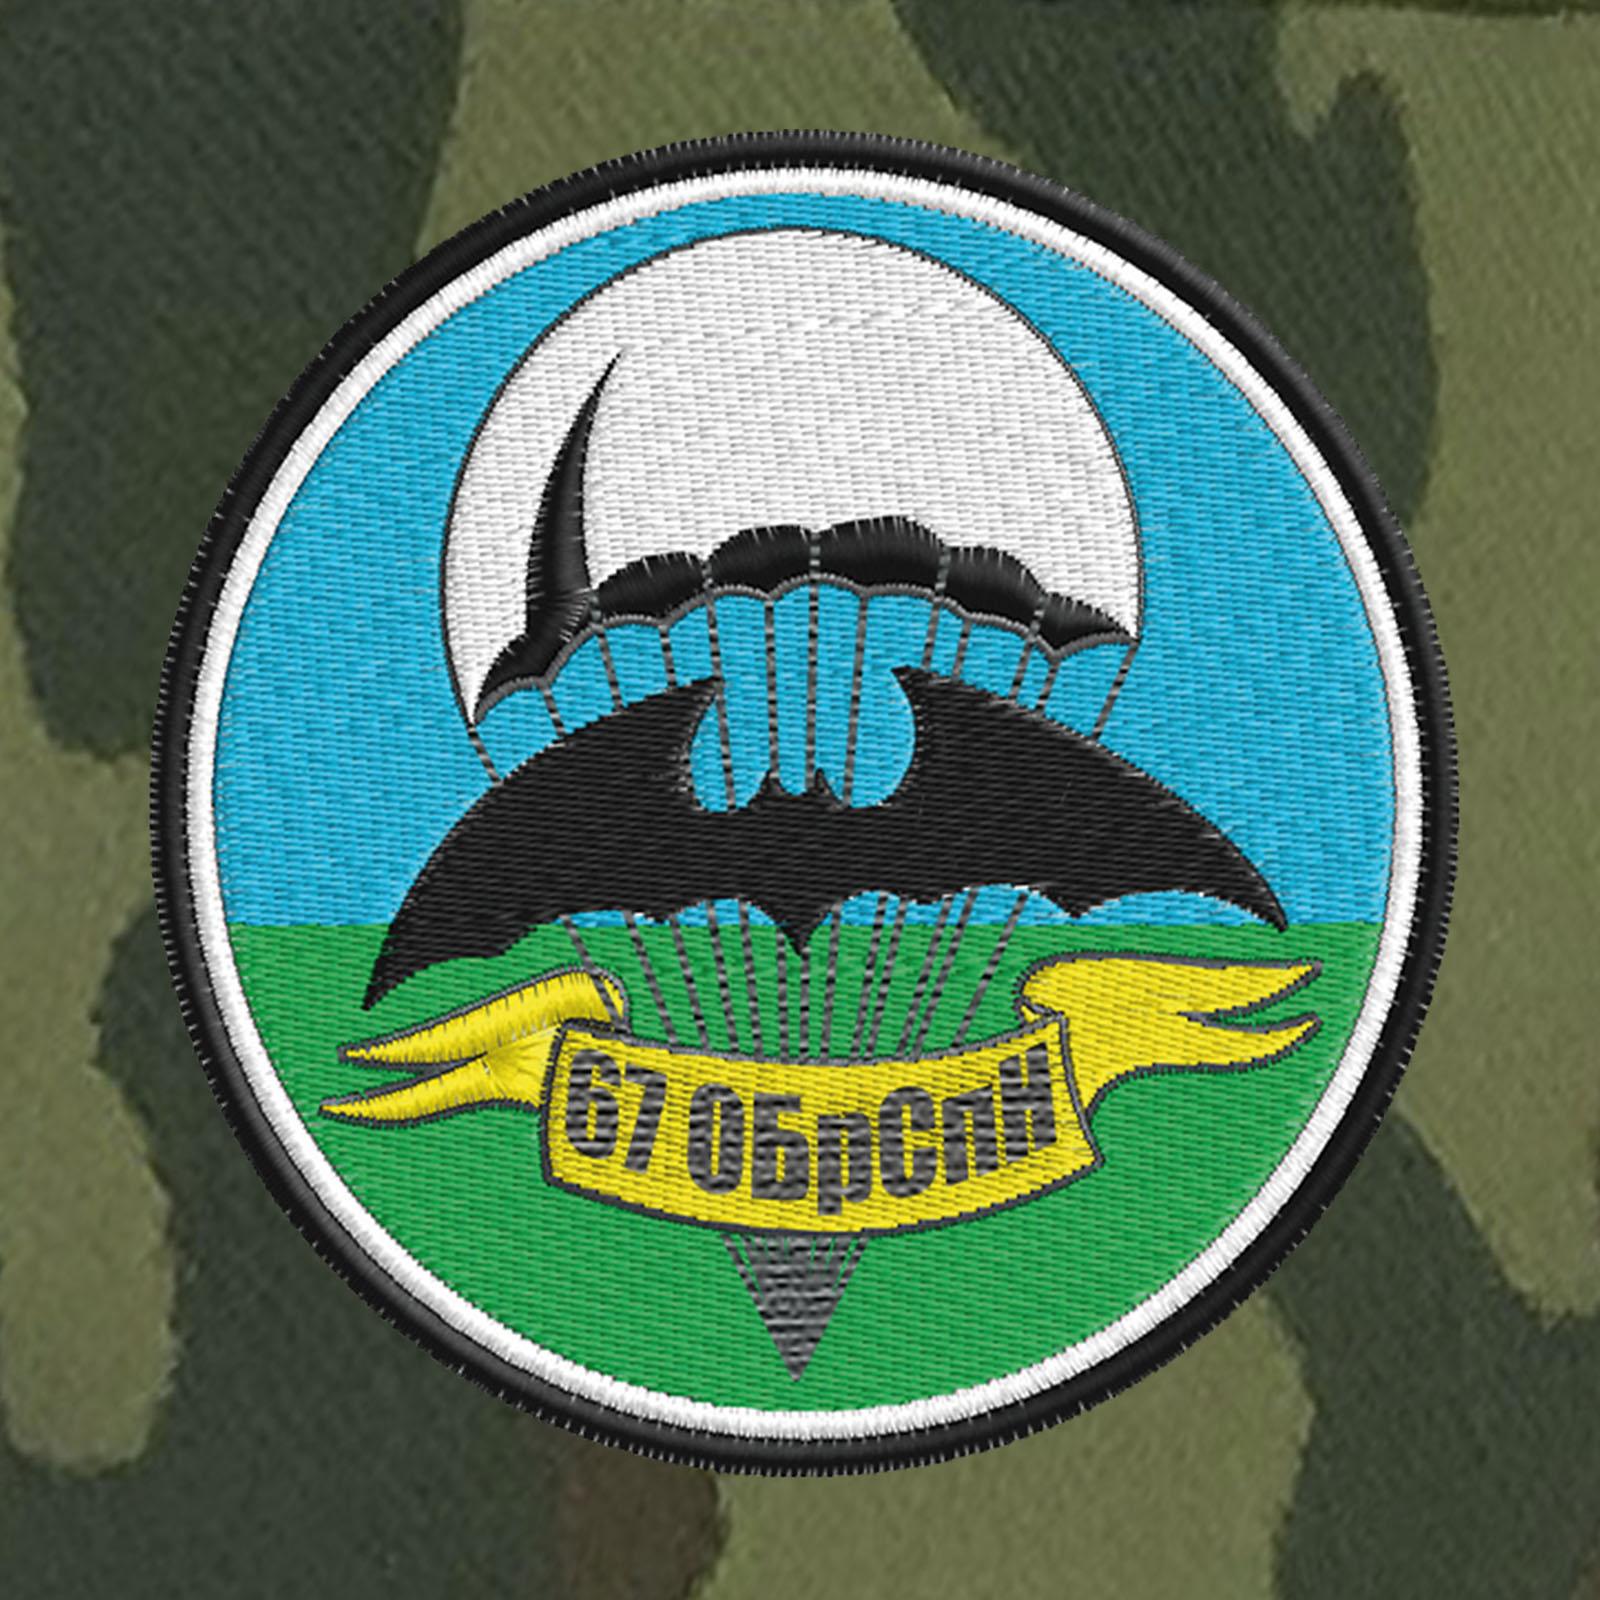 Уставная мужская кепка 67 ОБрСпН